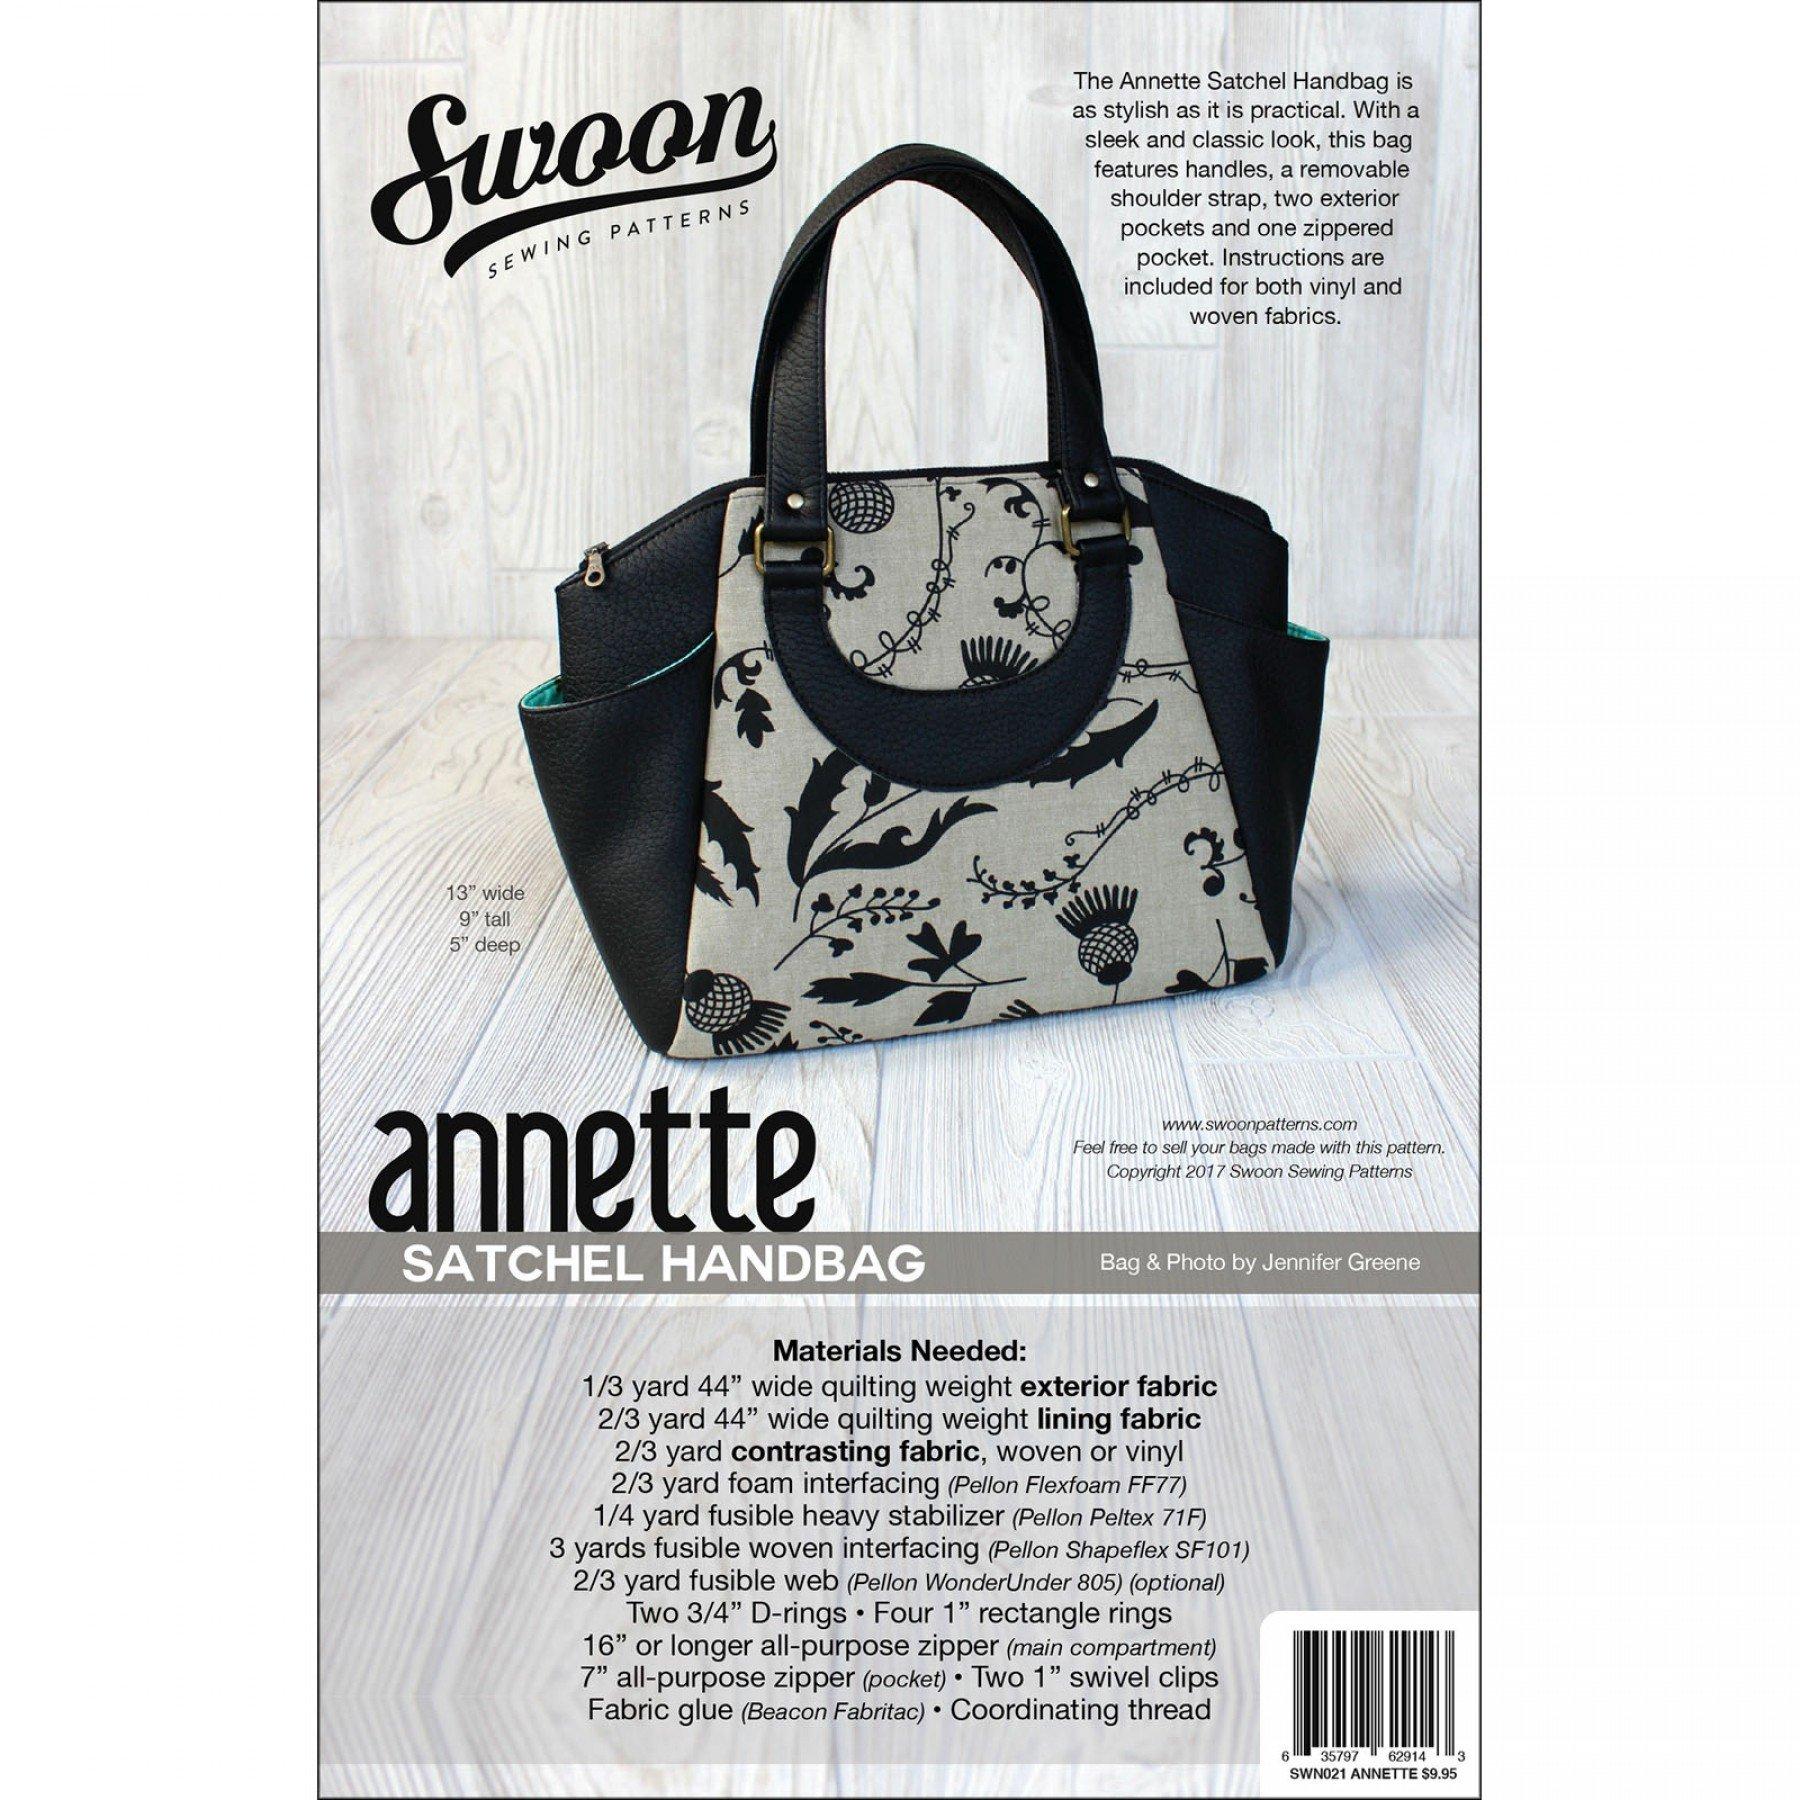 Annette Satchel Handbag | EE Schenck Co.